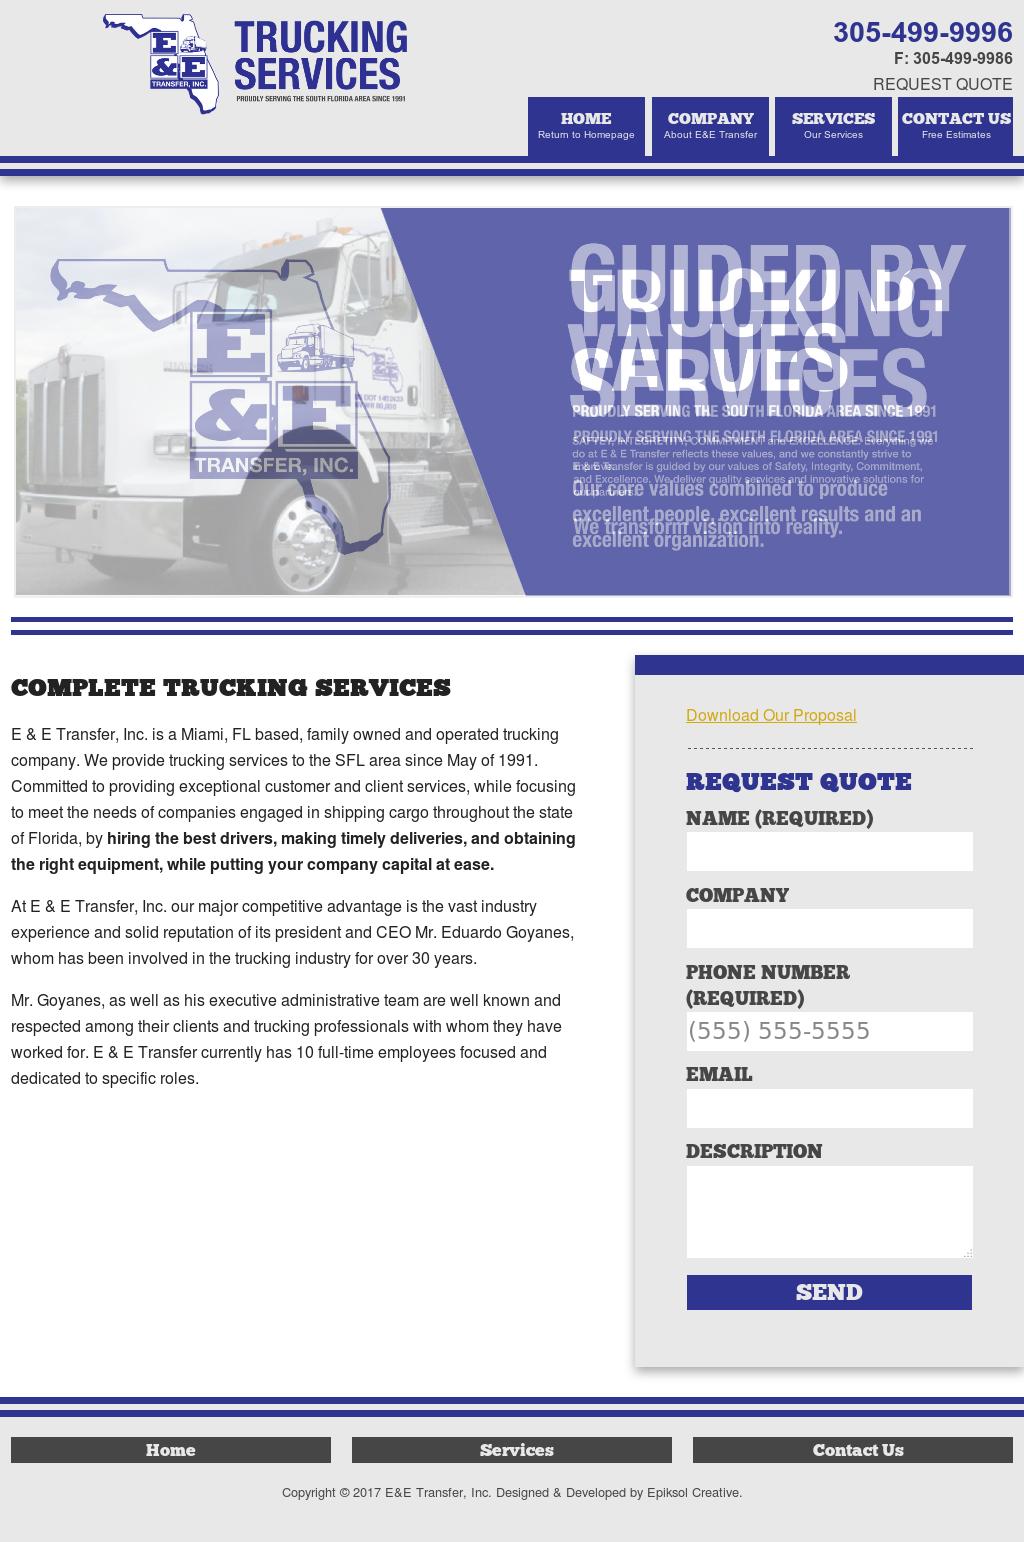 E&e Transfer Competitors, Revenue and Employees - Owler